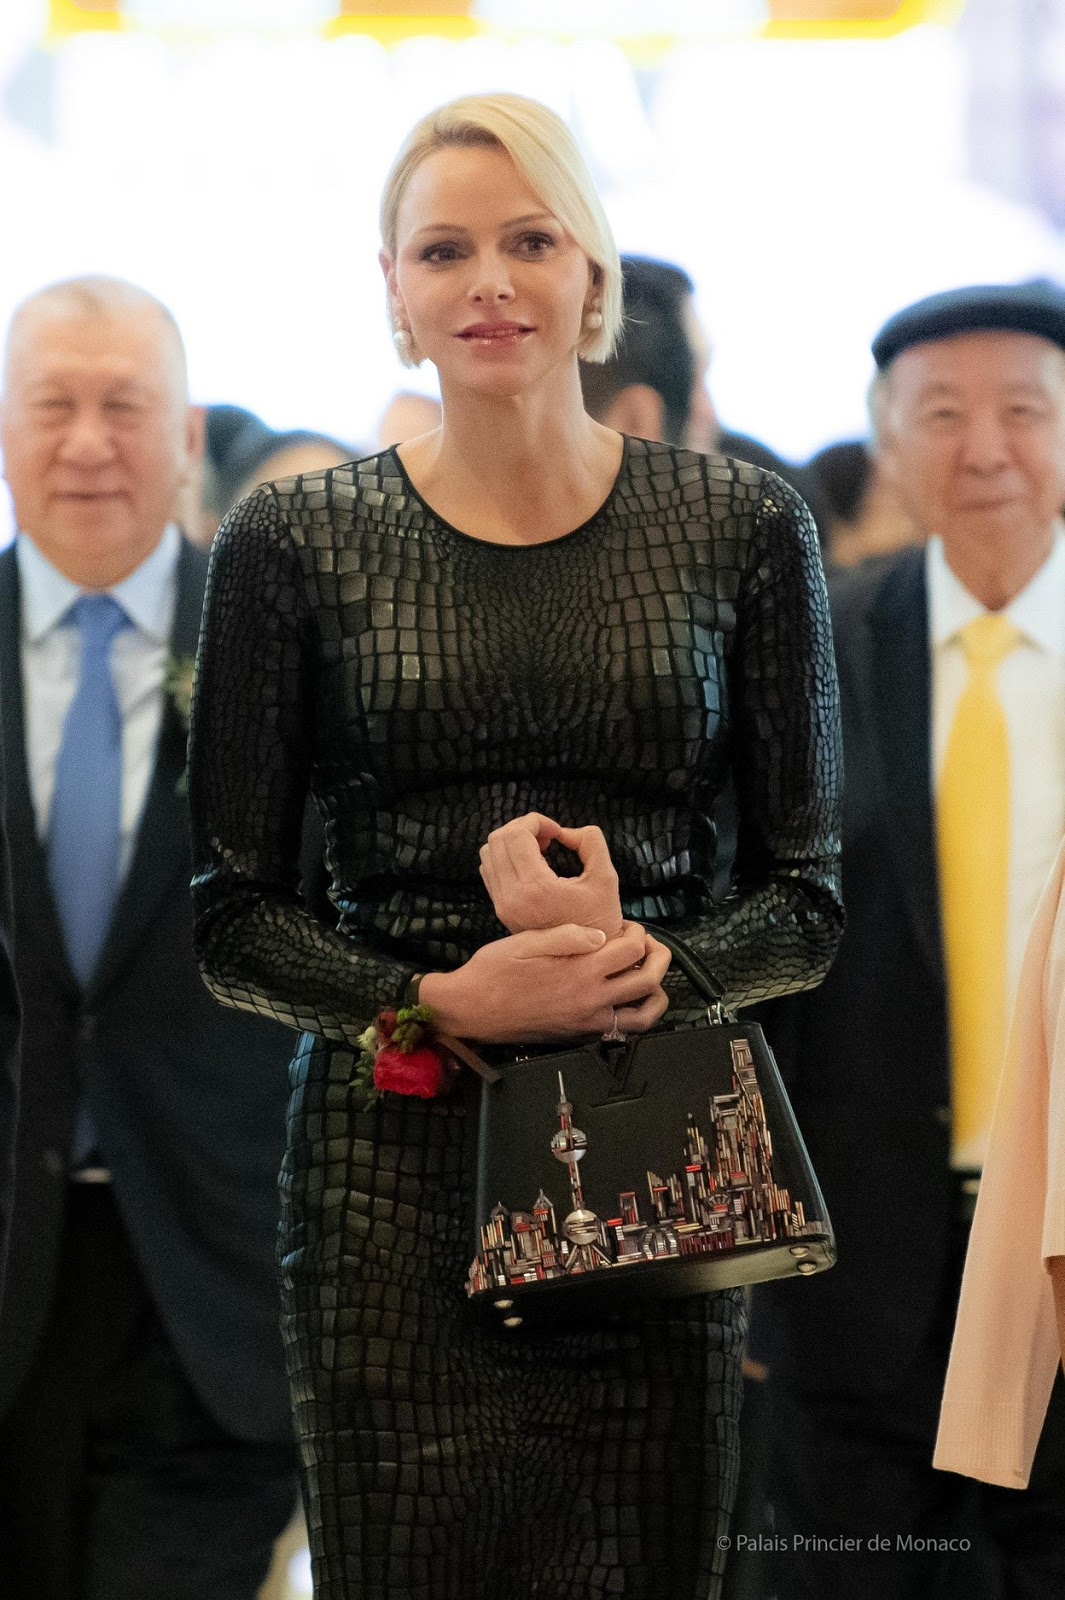 Princess Charlene Wears a black Tom Ford dress to Open Princess Grace Exhibition in Macau